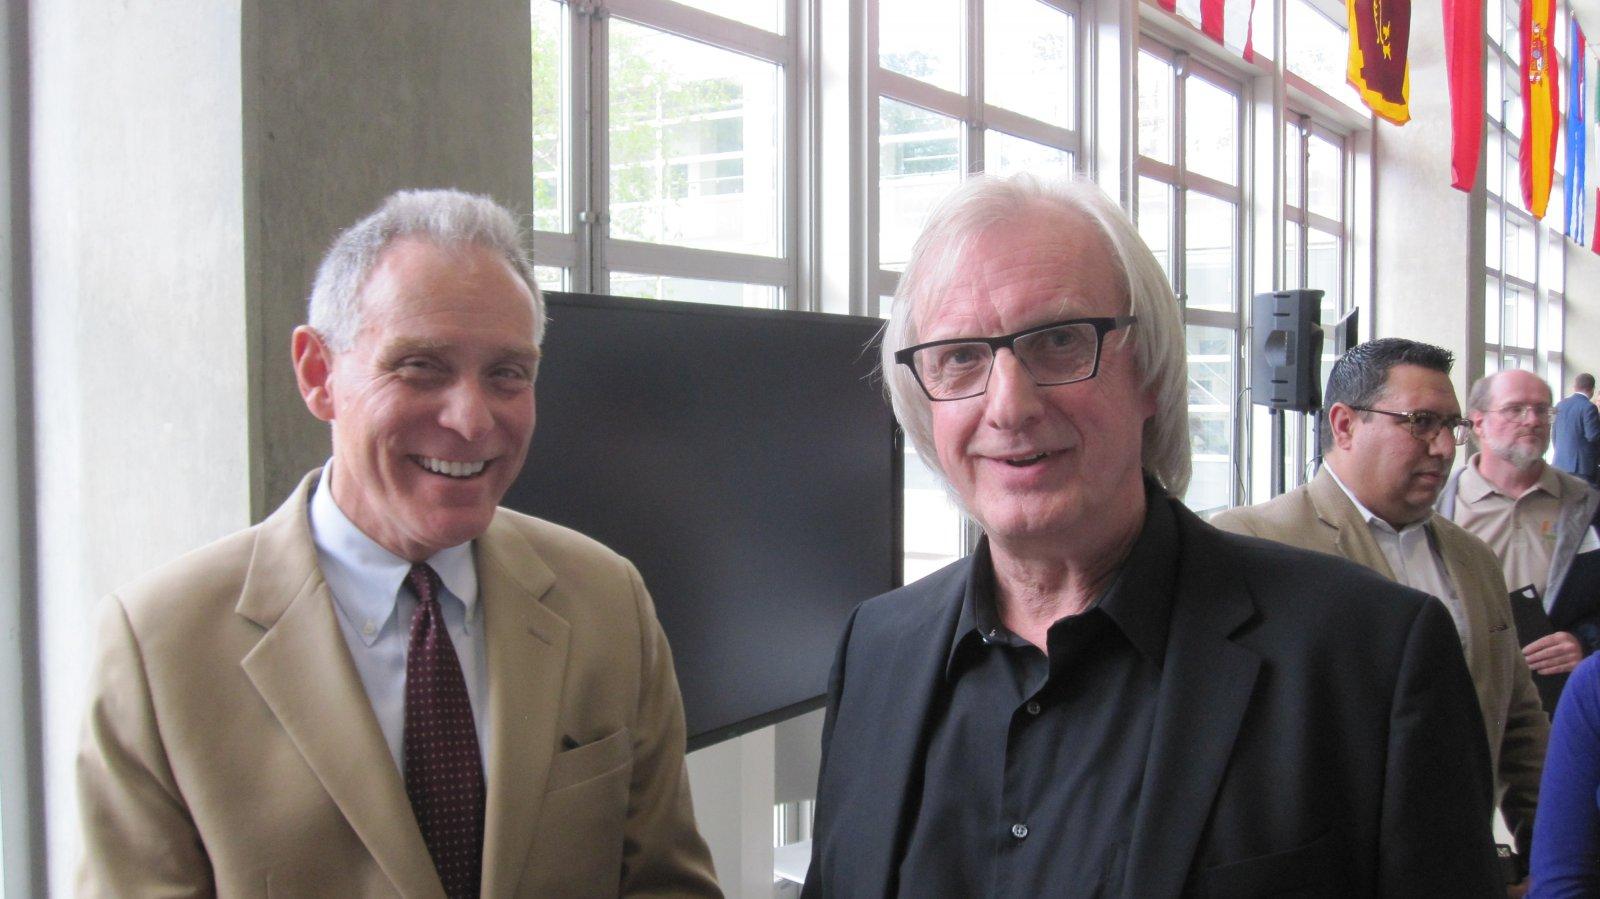 Jeff Fleming and Bob Greenstreet